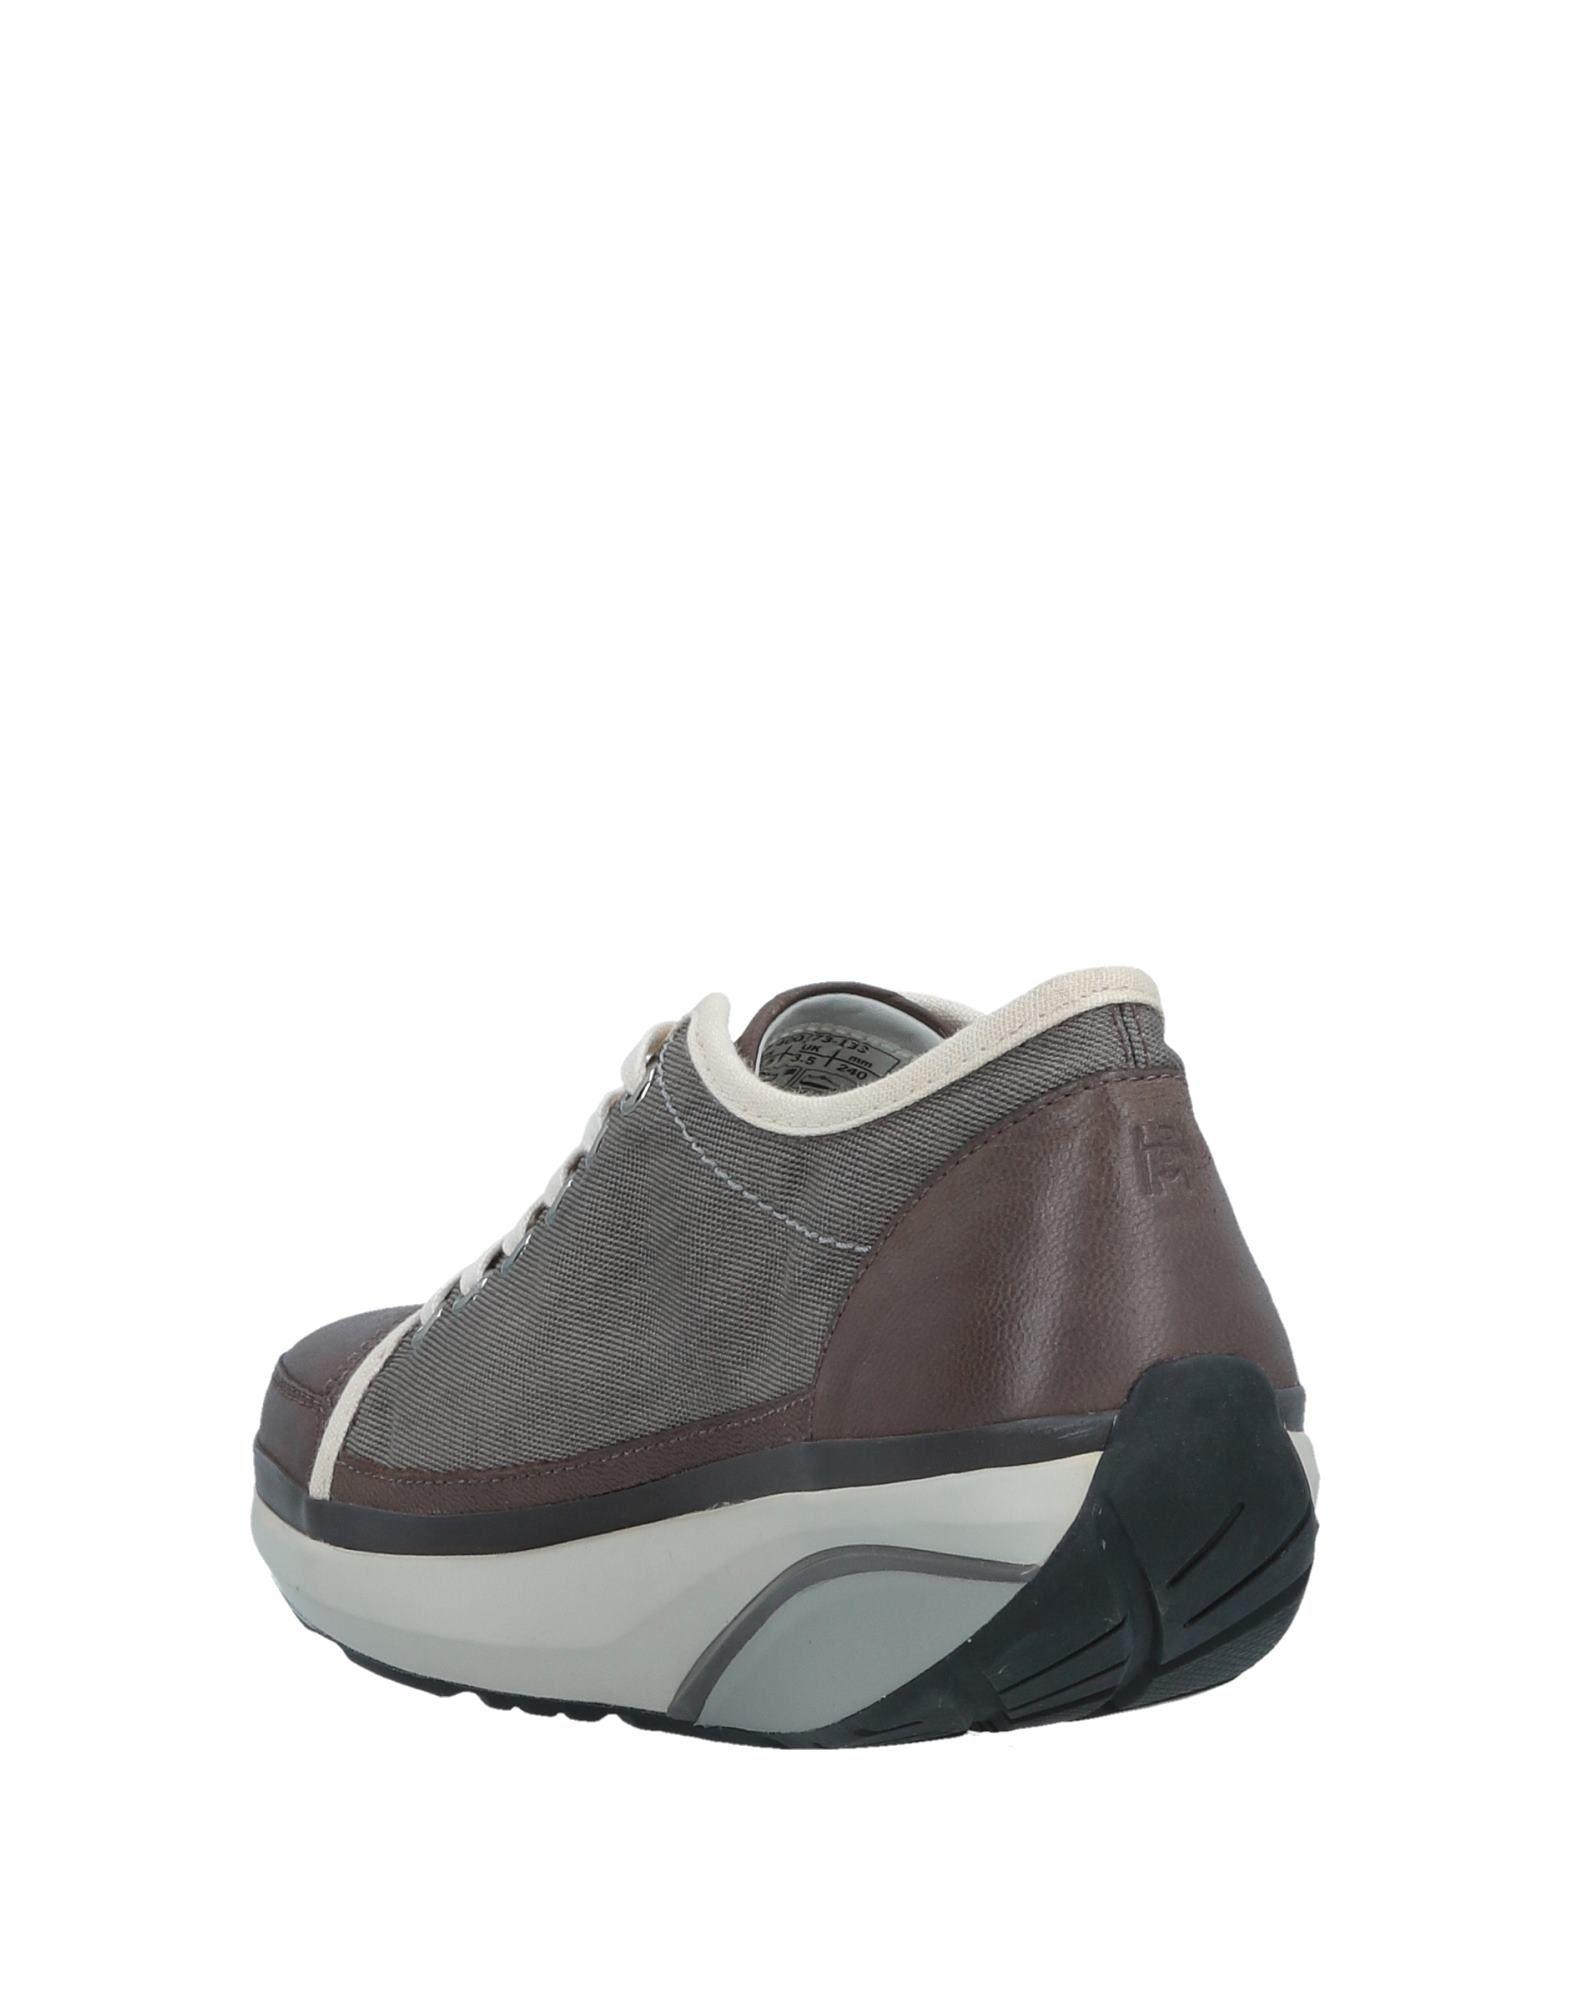 Stilvolle Damen billige Schuhe Mbt Sneakers Damen Stilvolle  11524873NB c80676